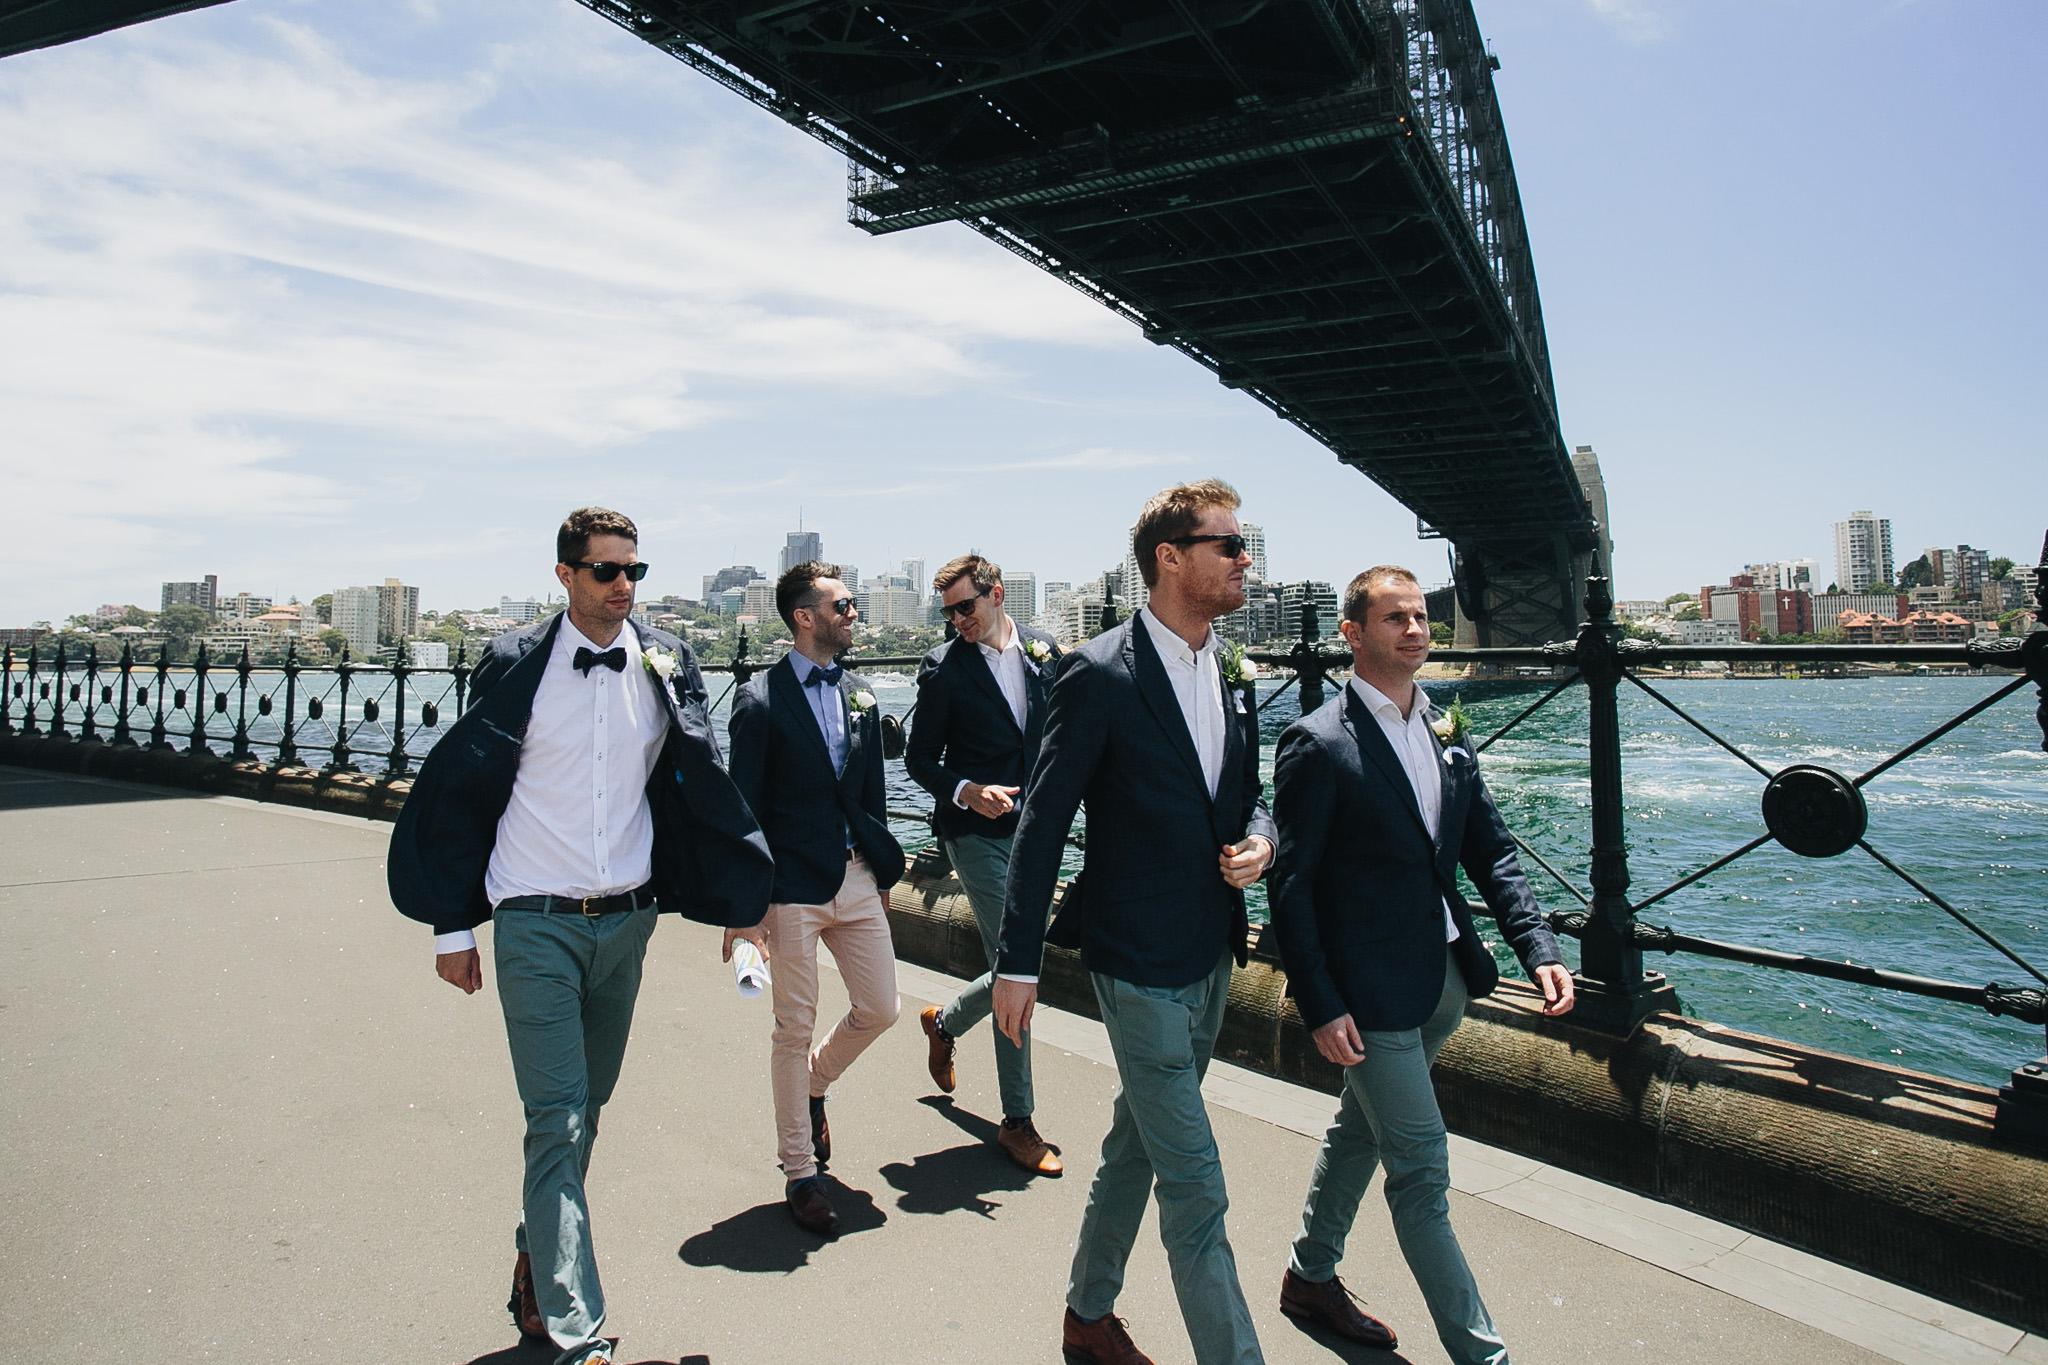 Groom and Groomsmen walking along Sydney Harbour under the Sydney harbour bridge on the wedding day